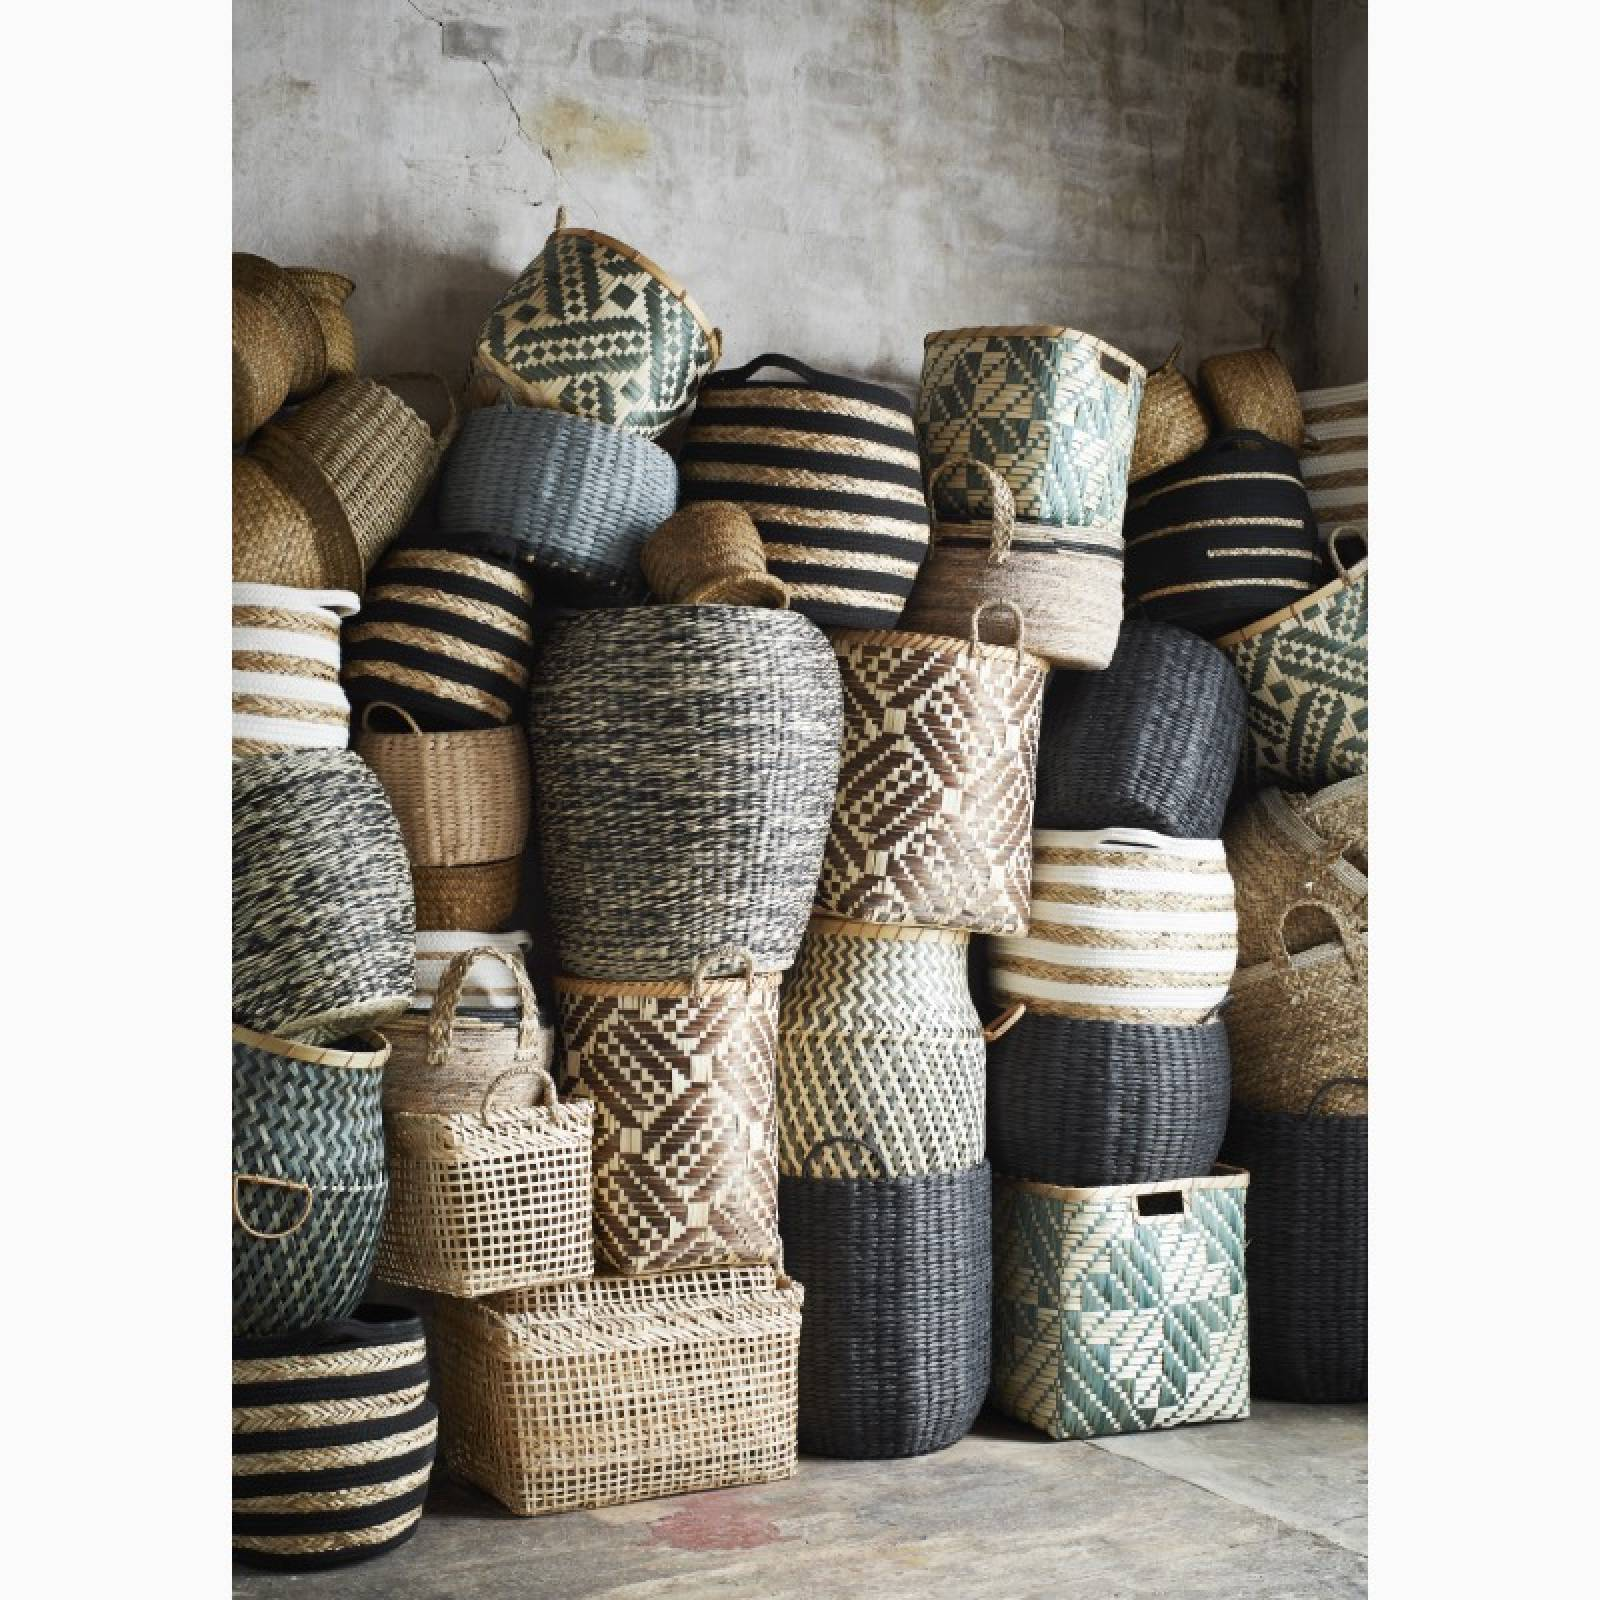 Small Circular Basket With Handles & Cotton Trim 34x21cm thumbnails